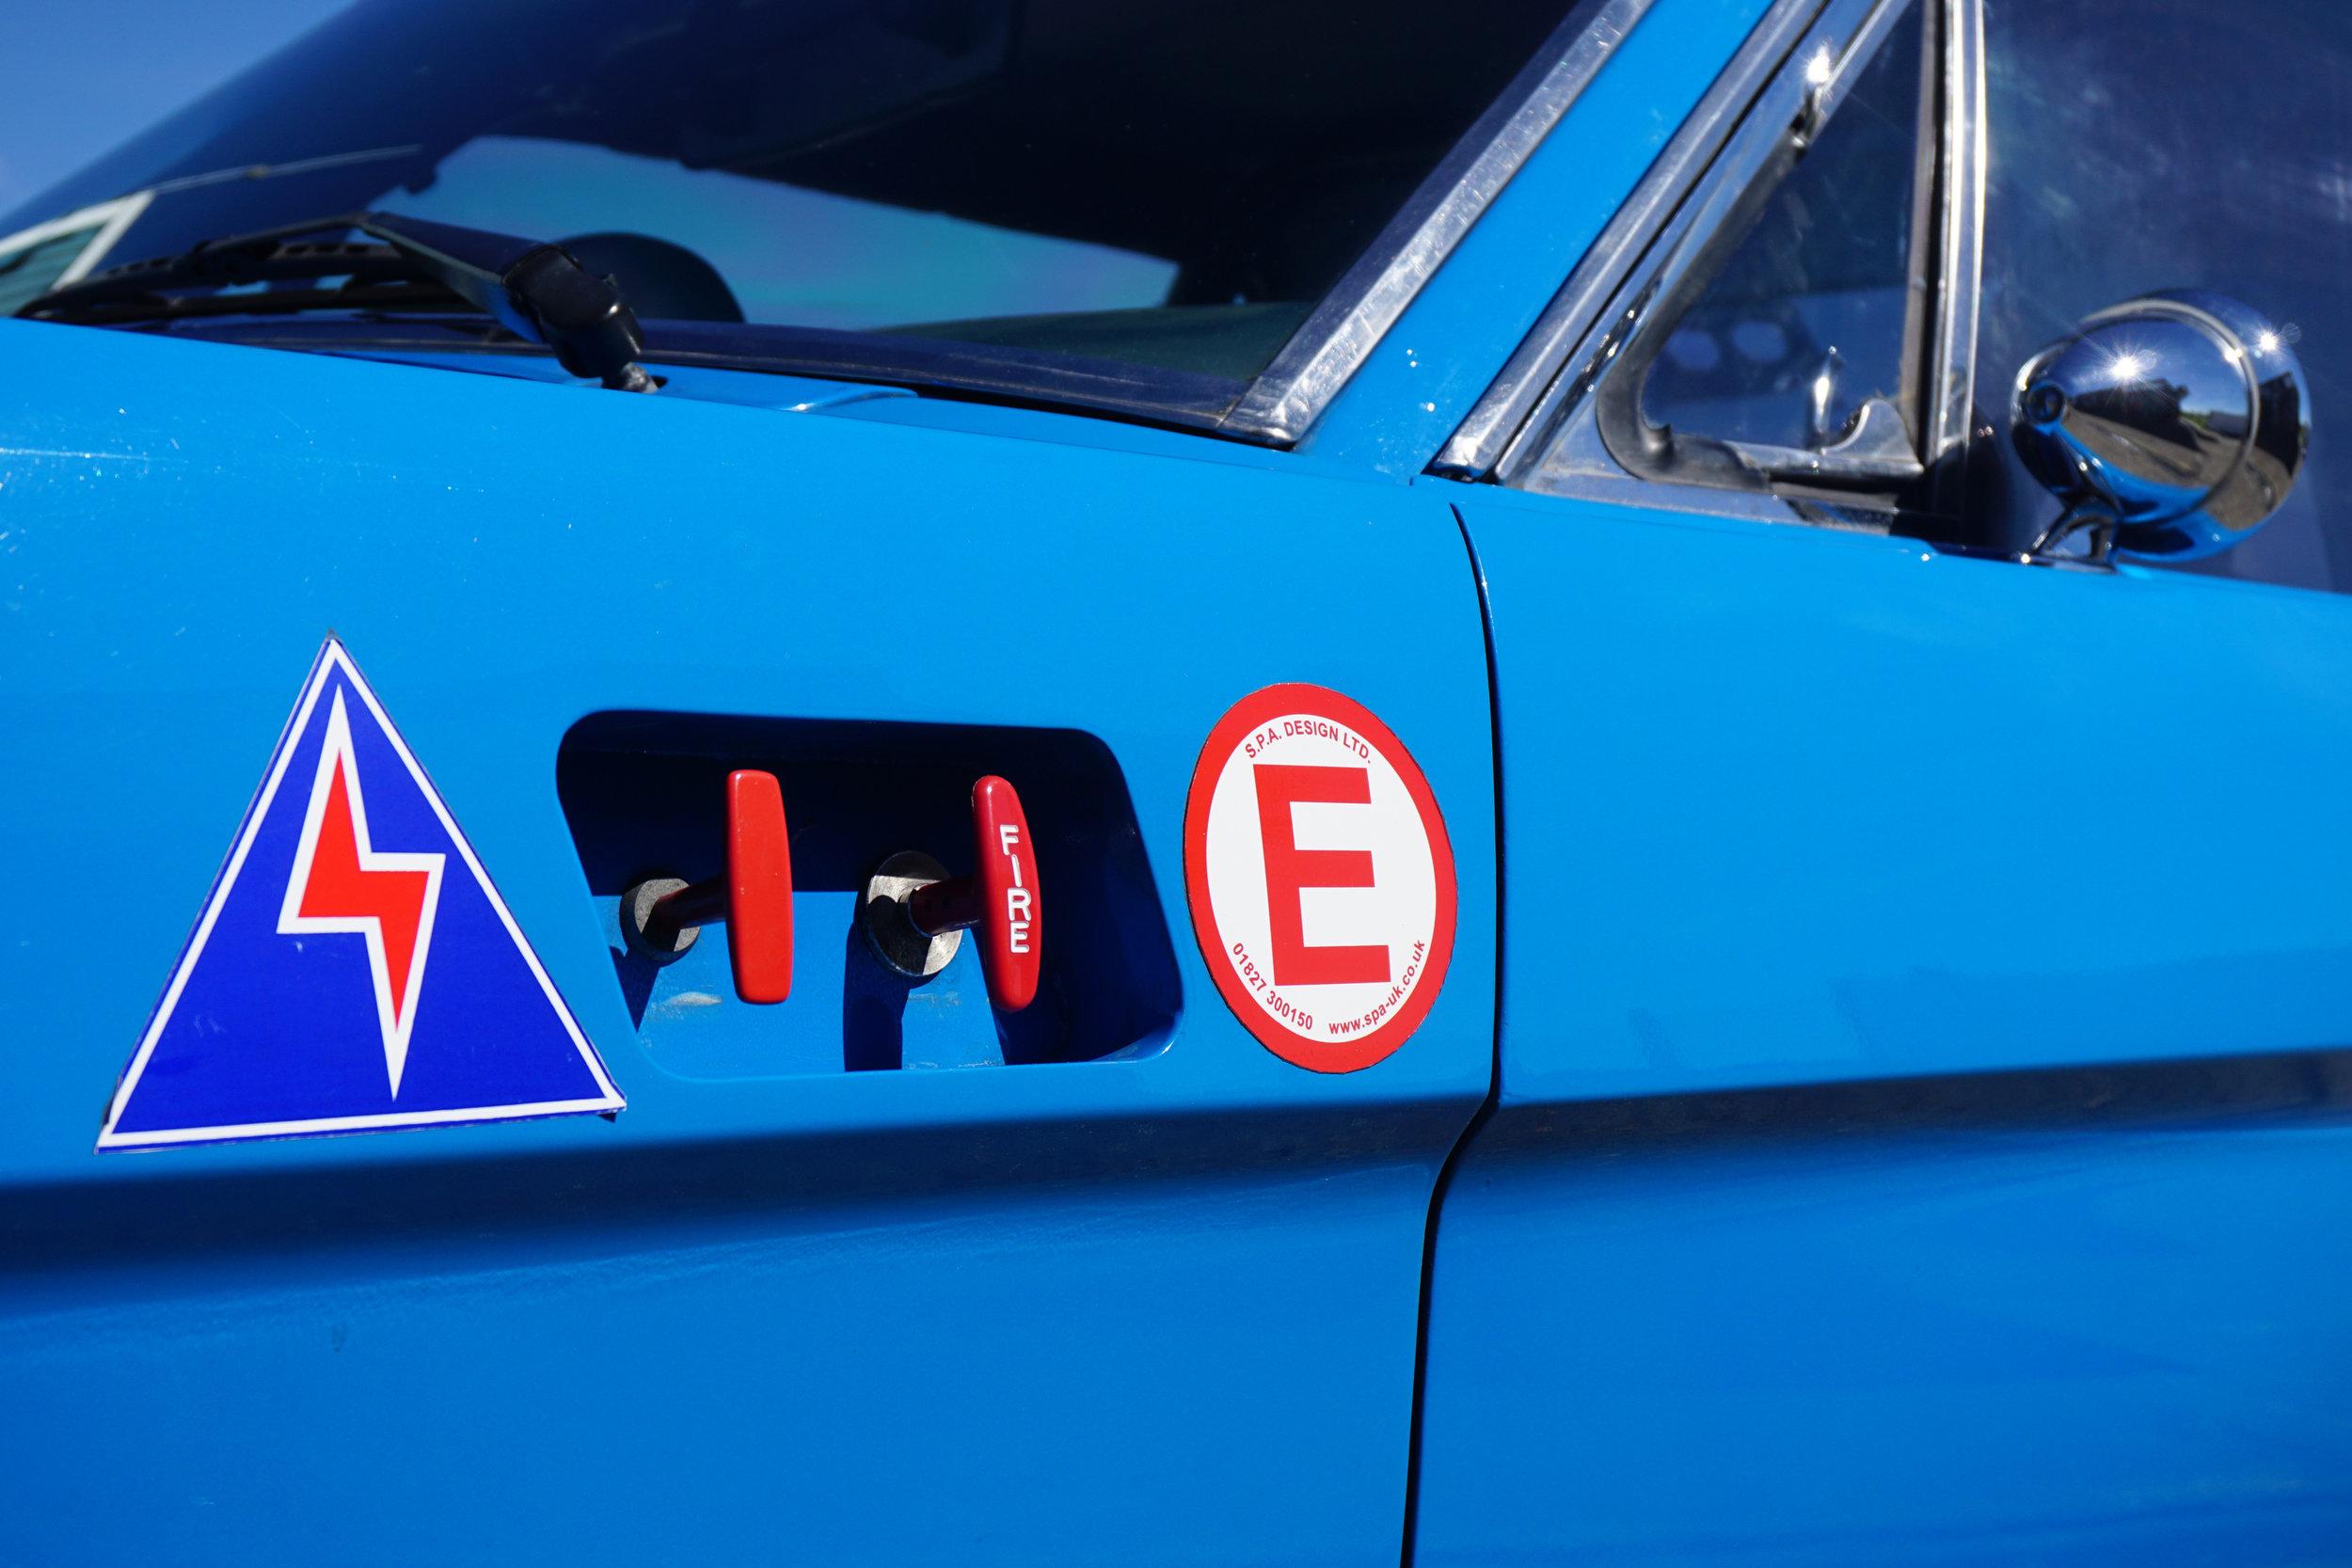 Blue-Mustang-04.jpg